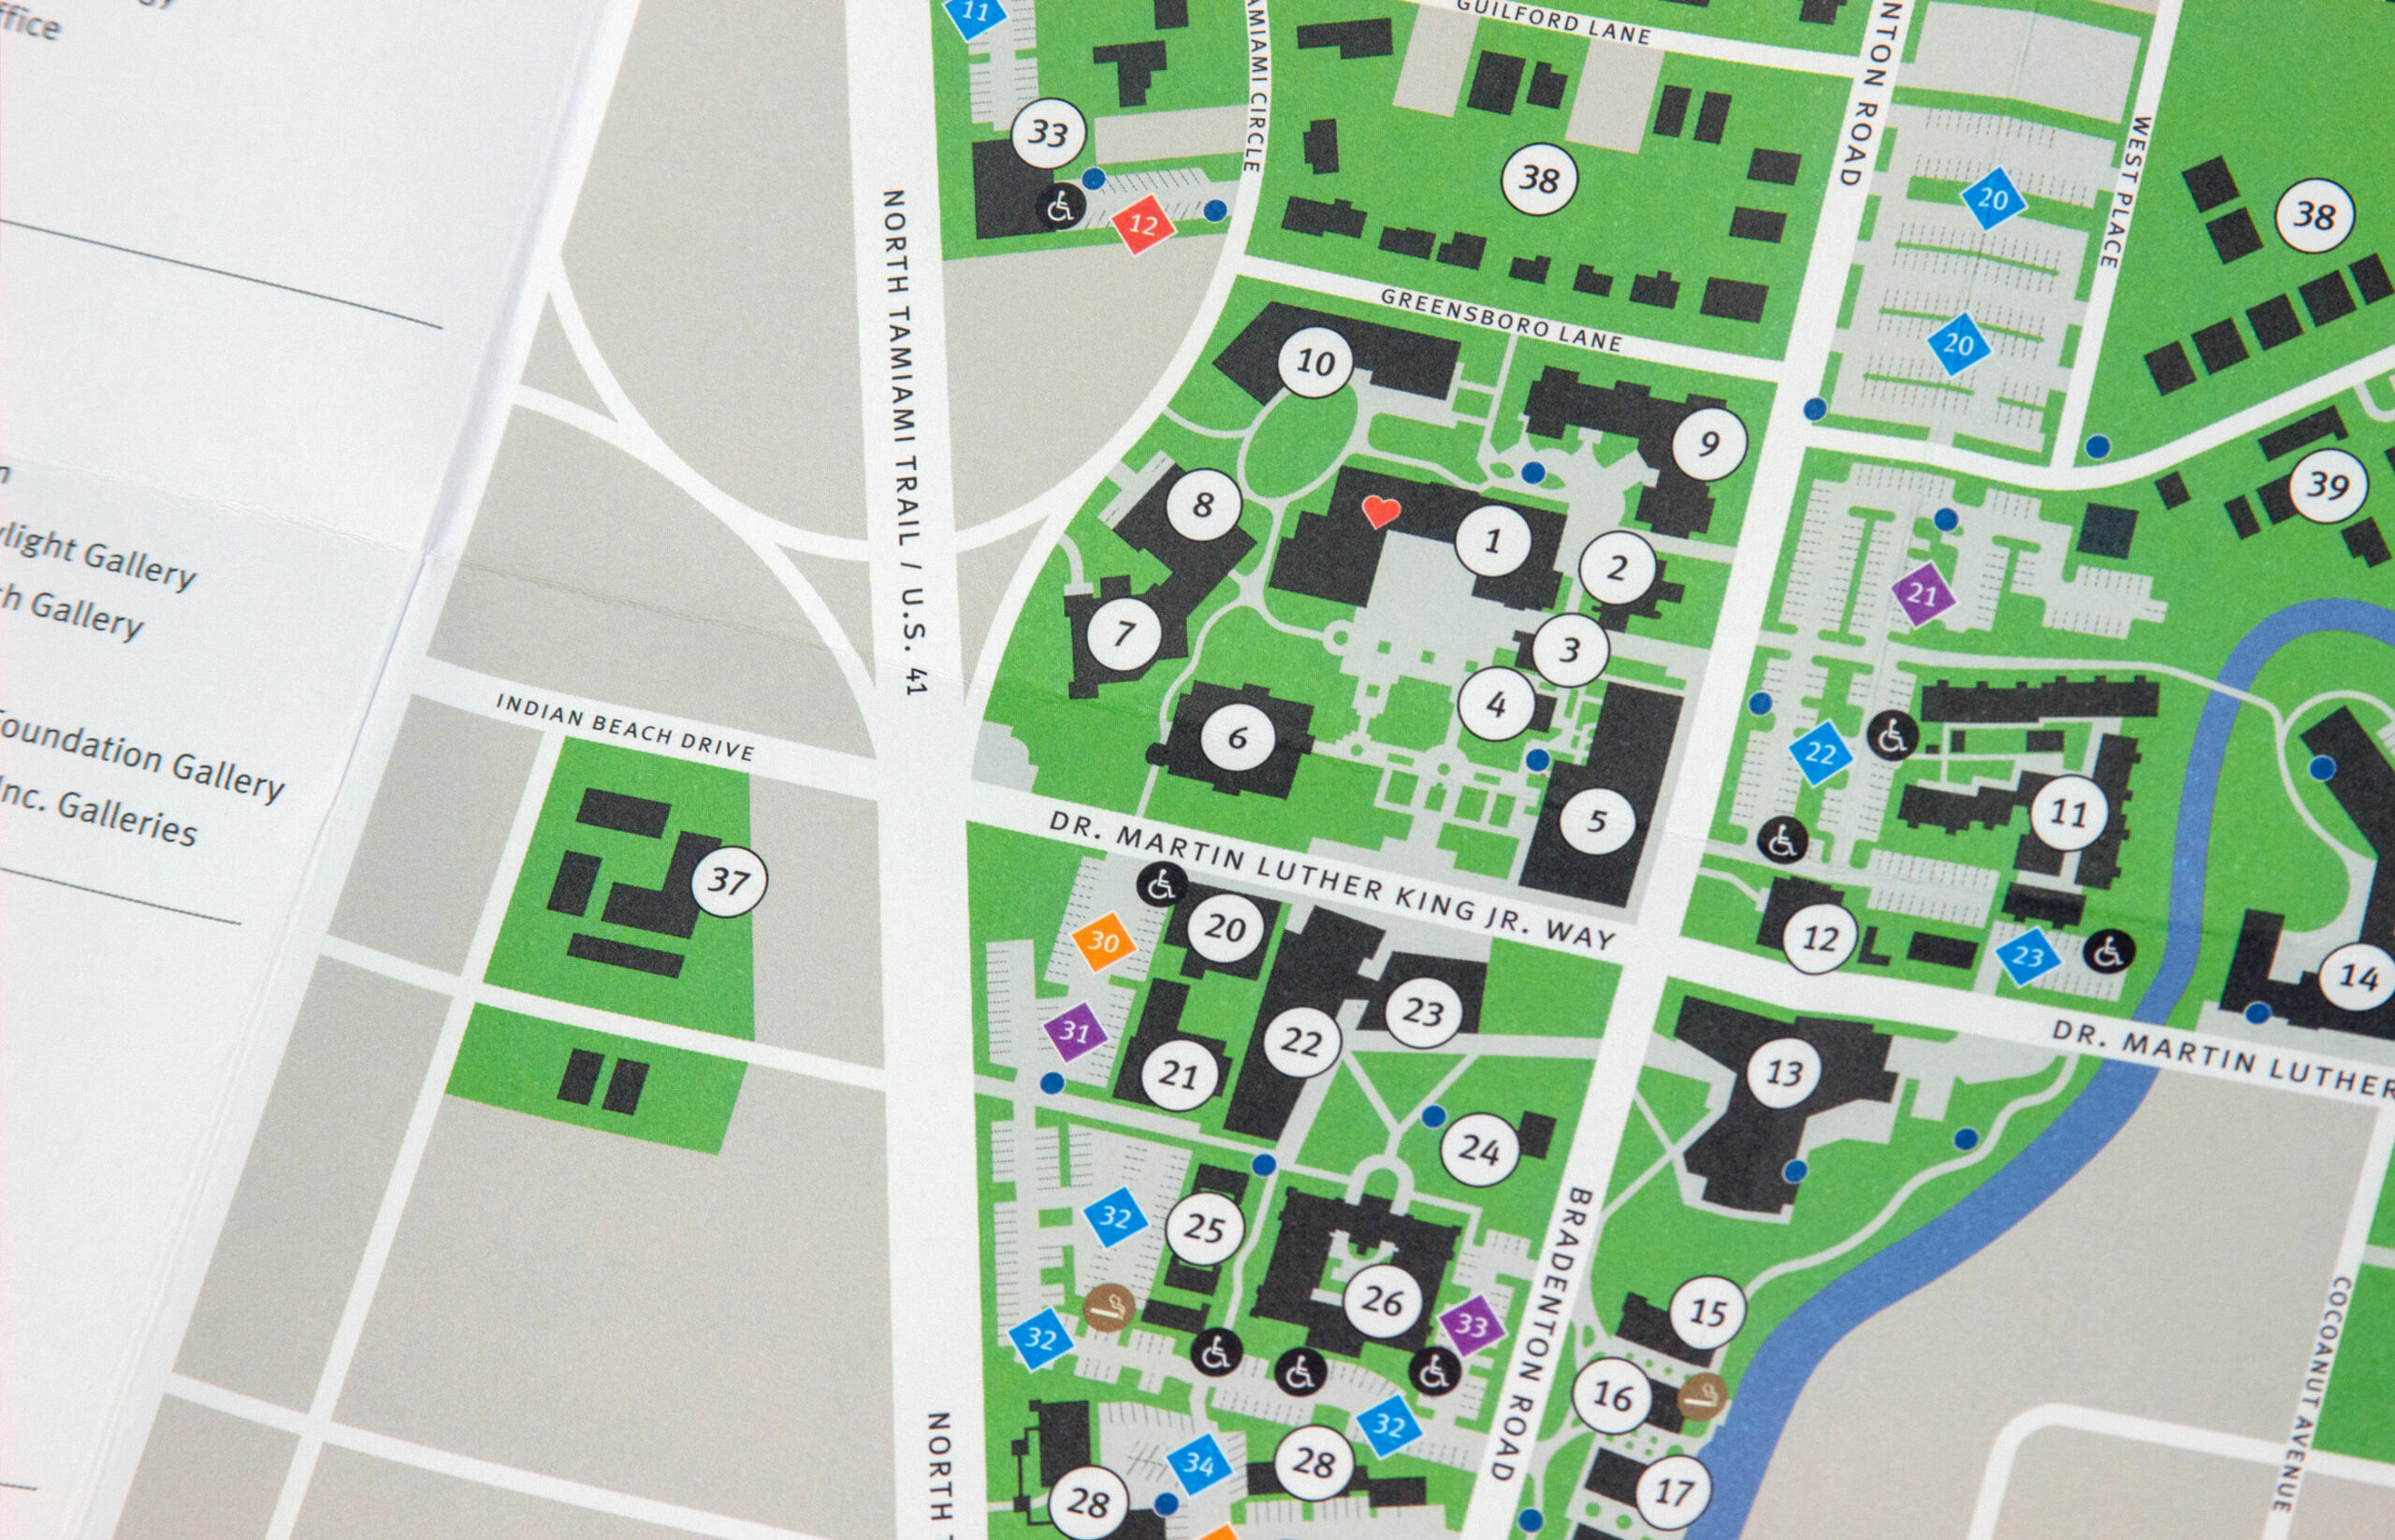 RCAD_Map_Kiosk_Detail_03